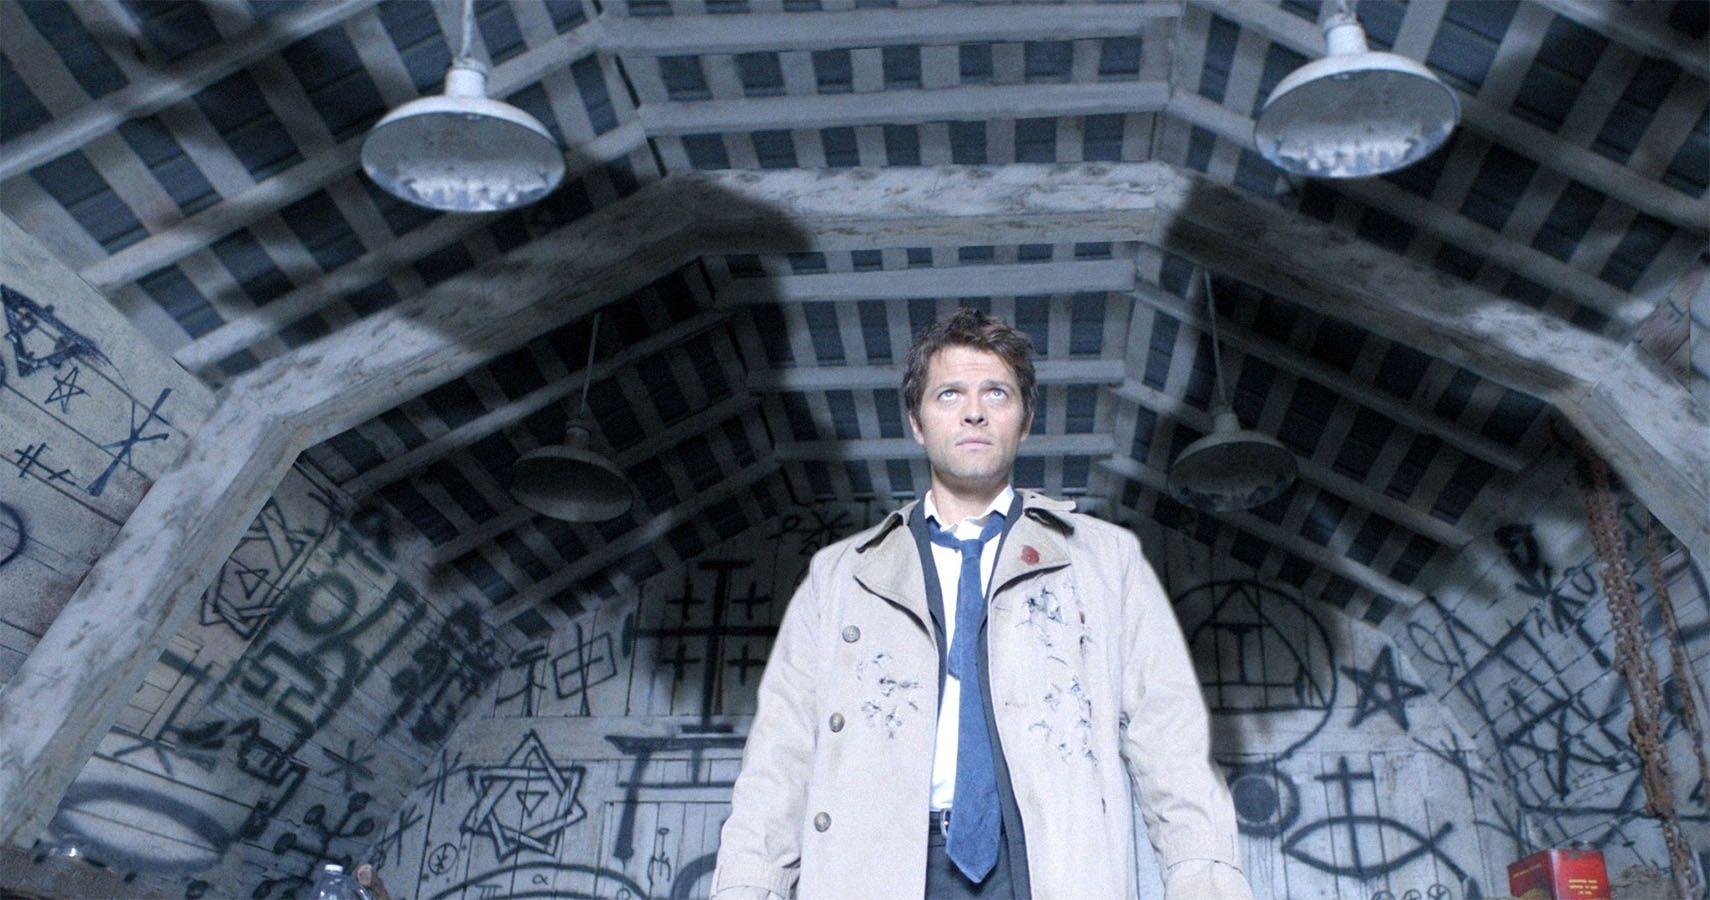 Supernatural: 10 Weaknesses The Angels (Even Castiel) Have